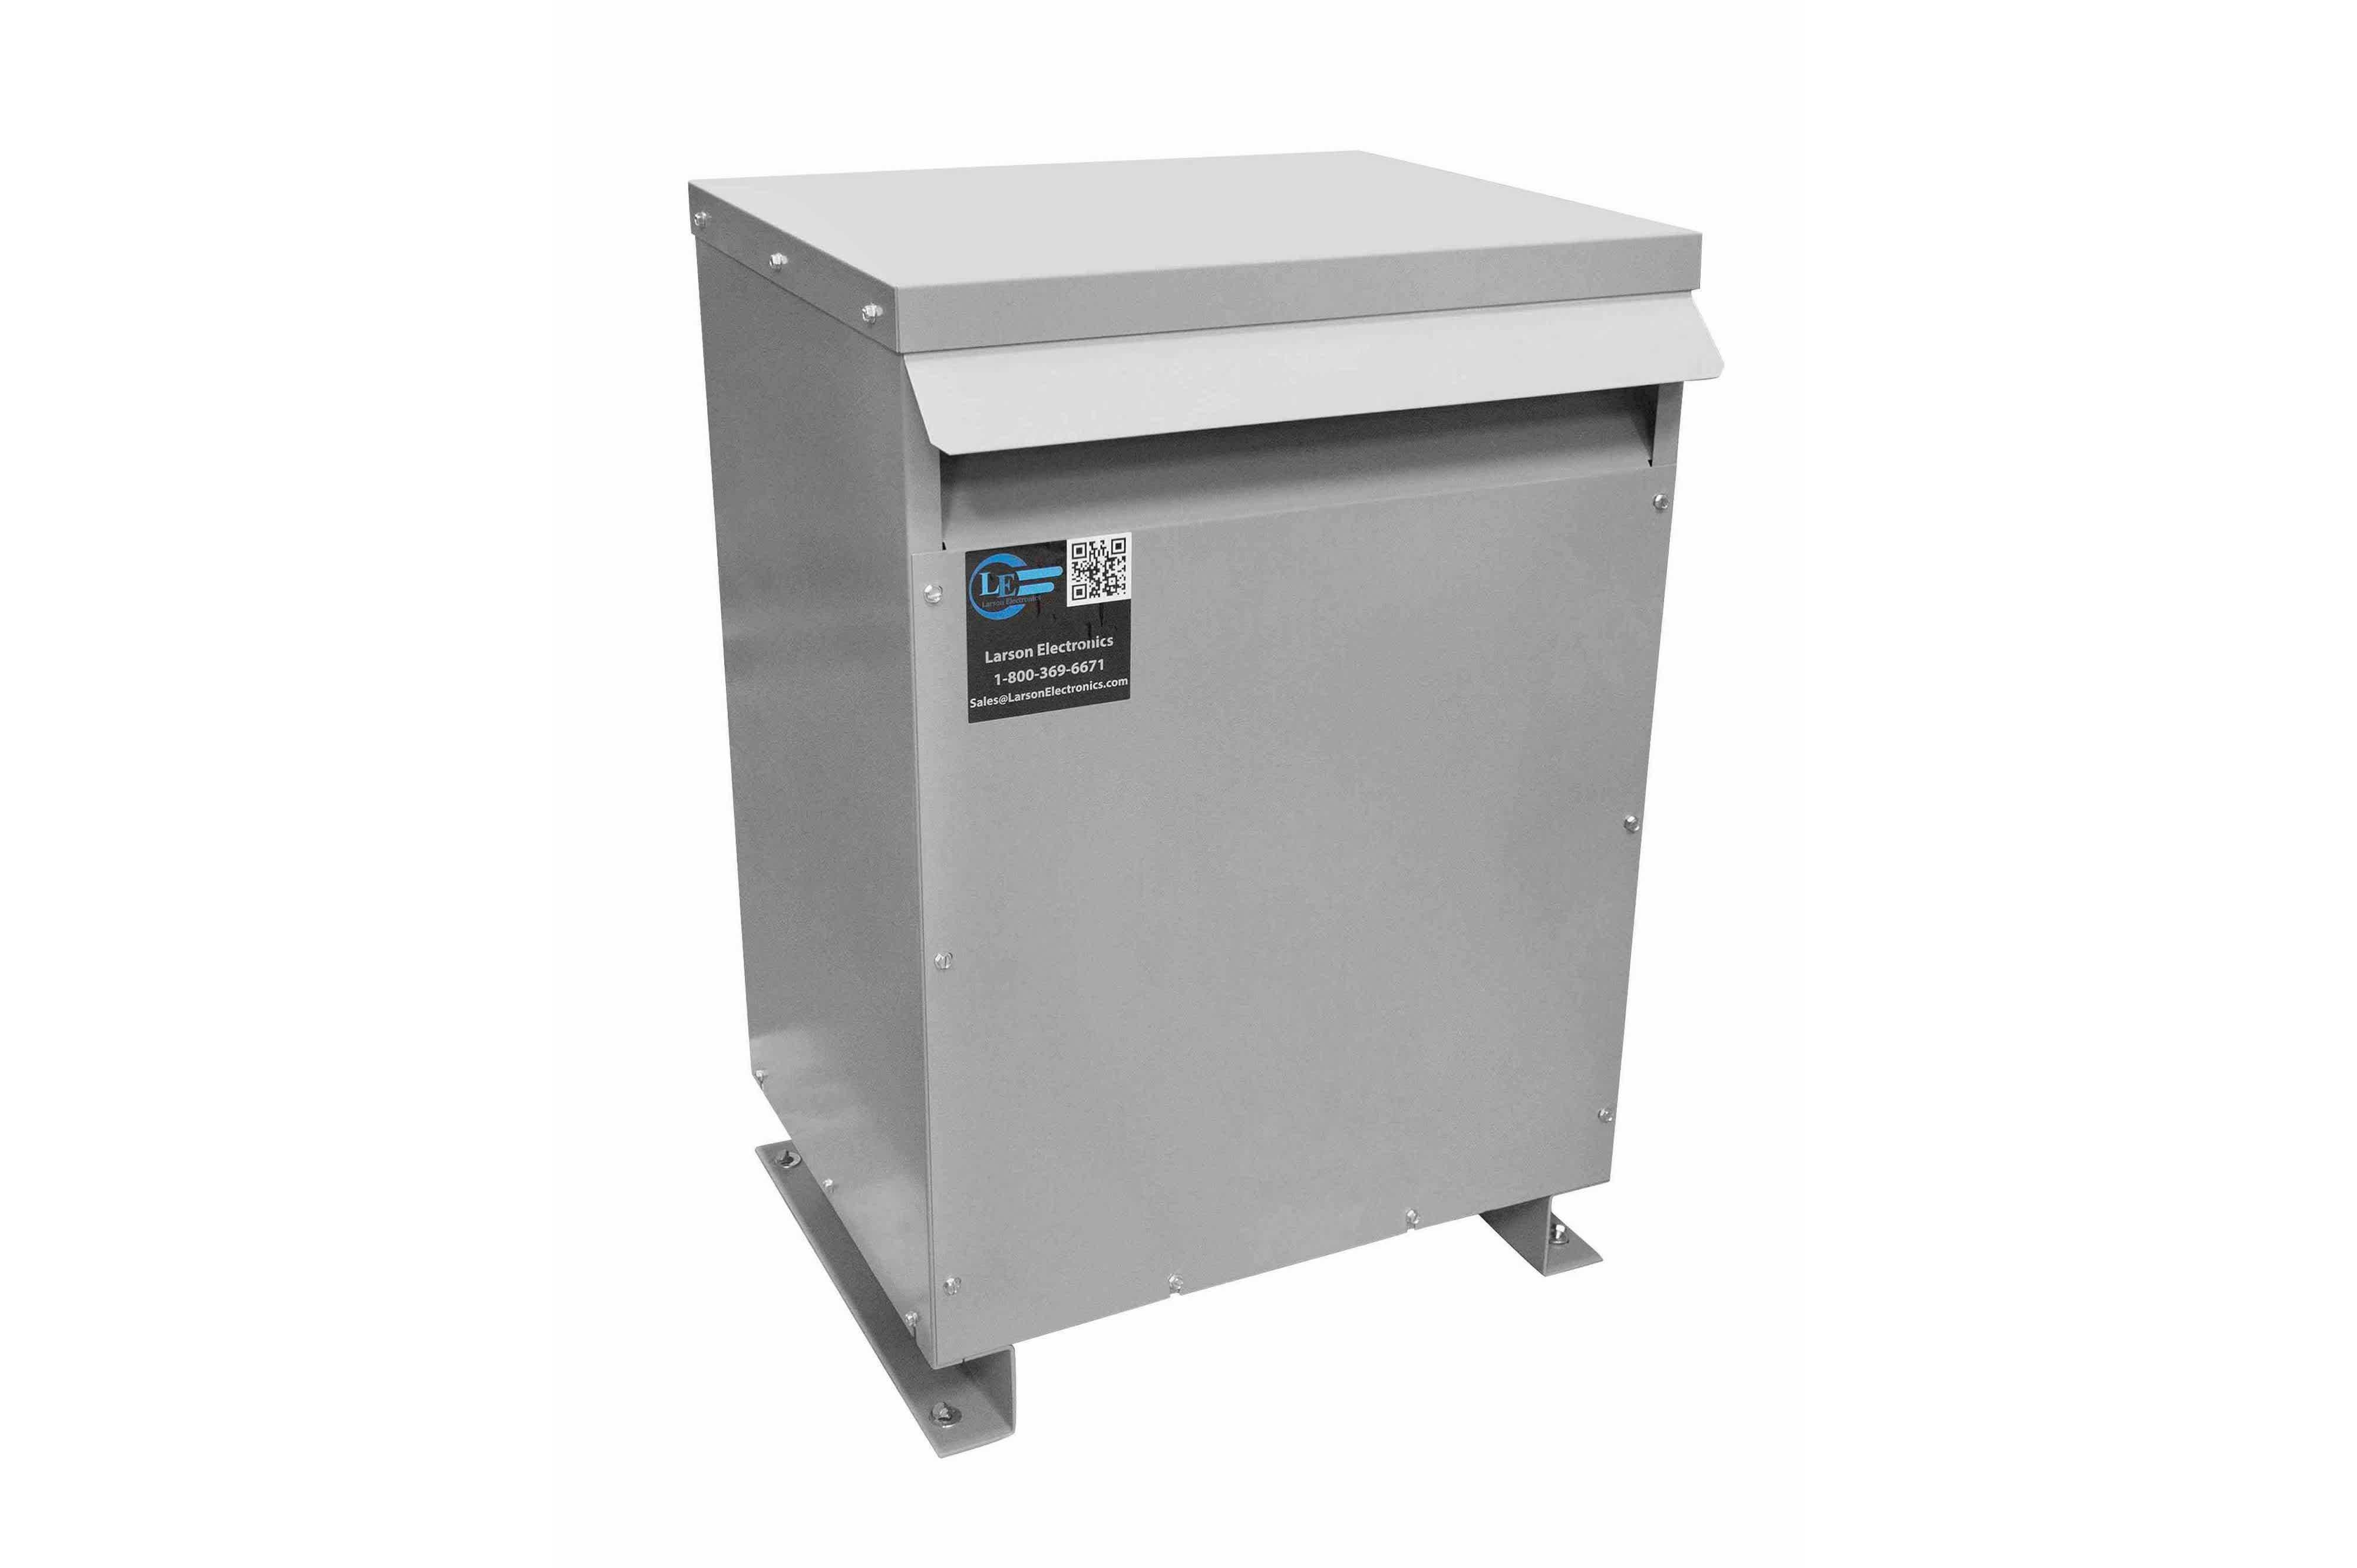 20 kVA 3PH Isolation Transformer, 208V Wye Primary, 400V Delta Secondary, N3R, Ventilated, 60 Hz